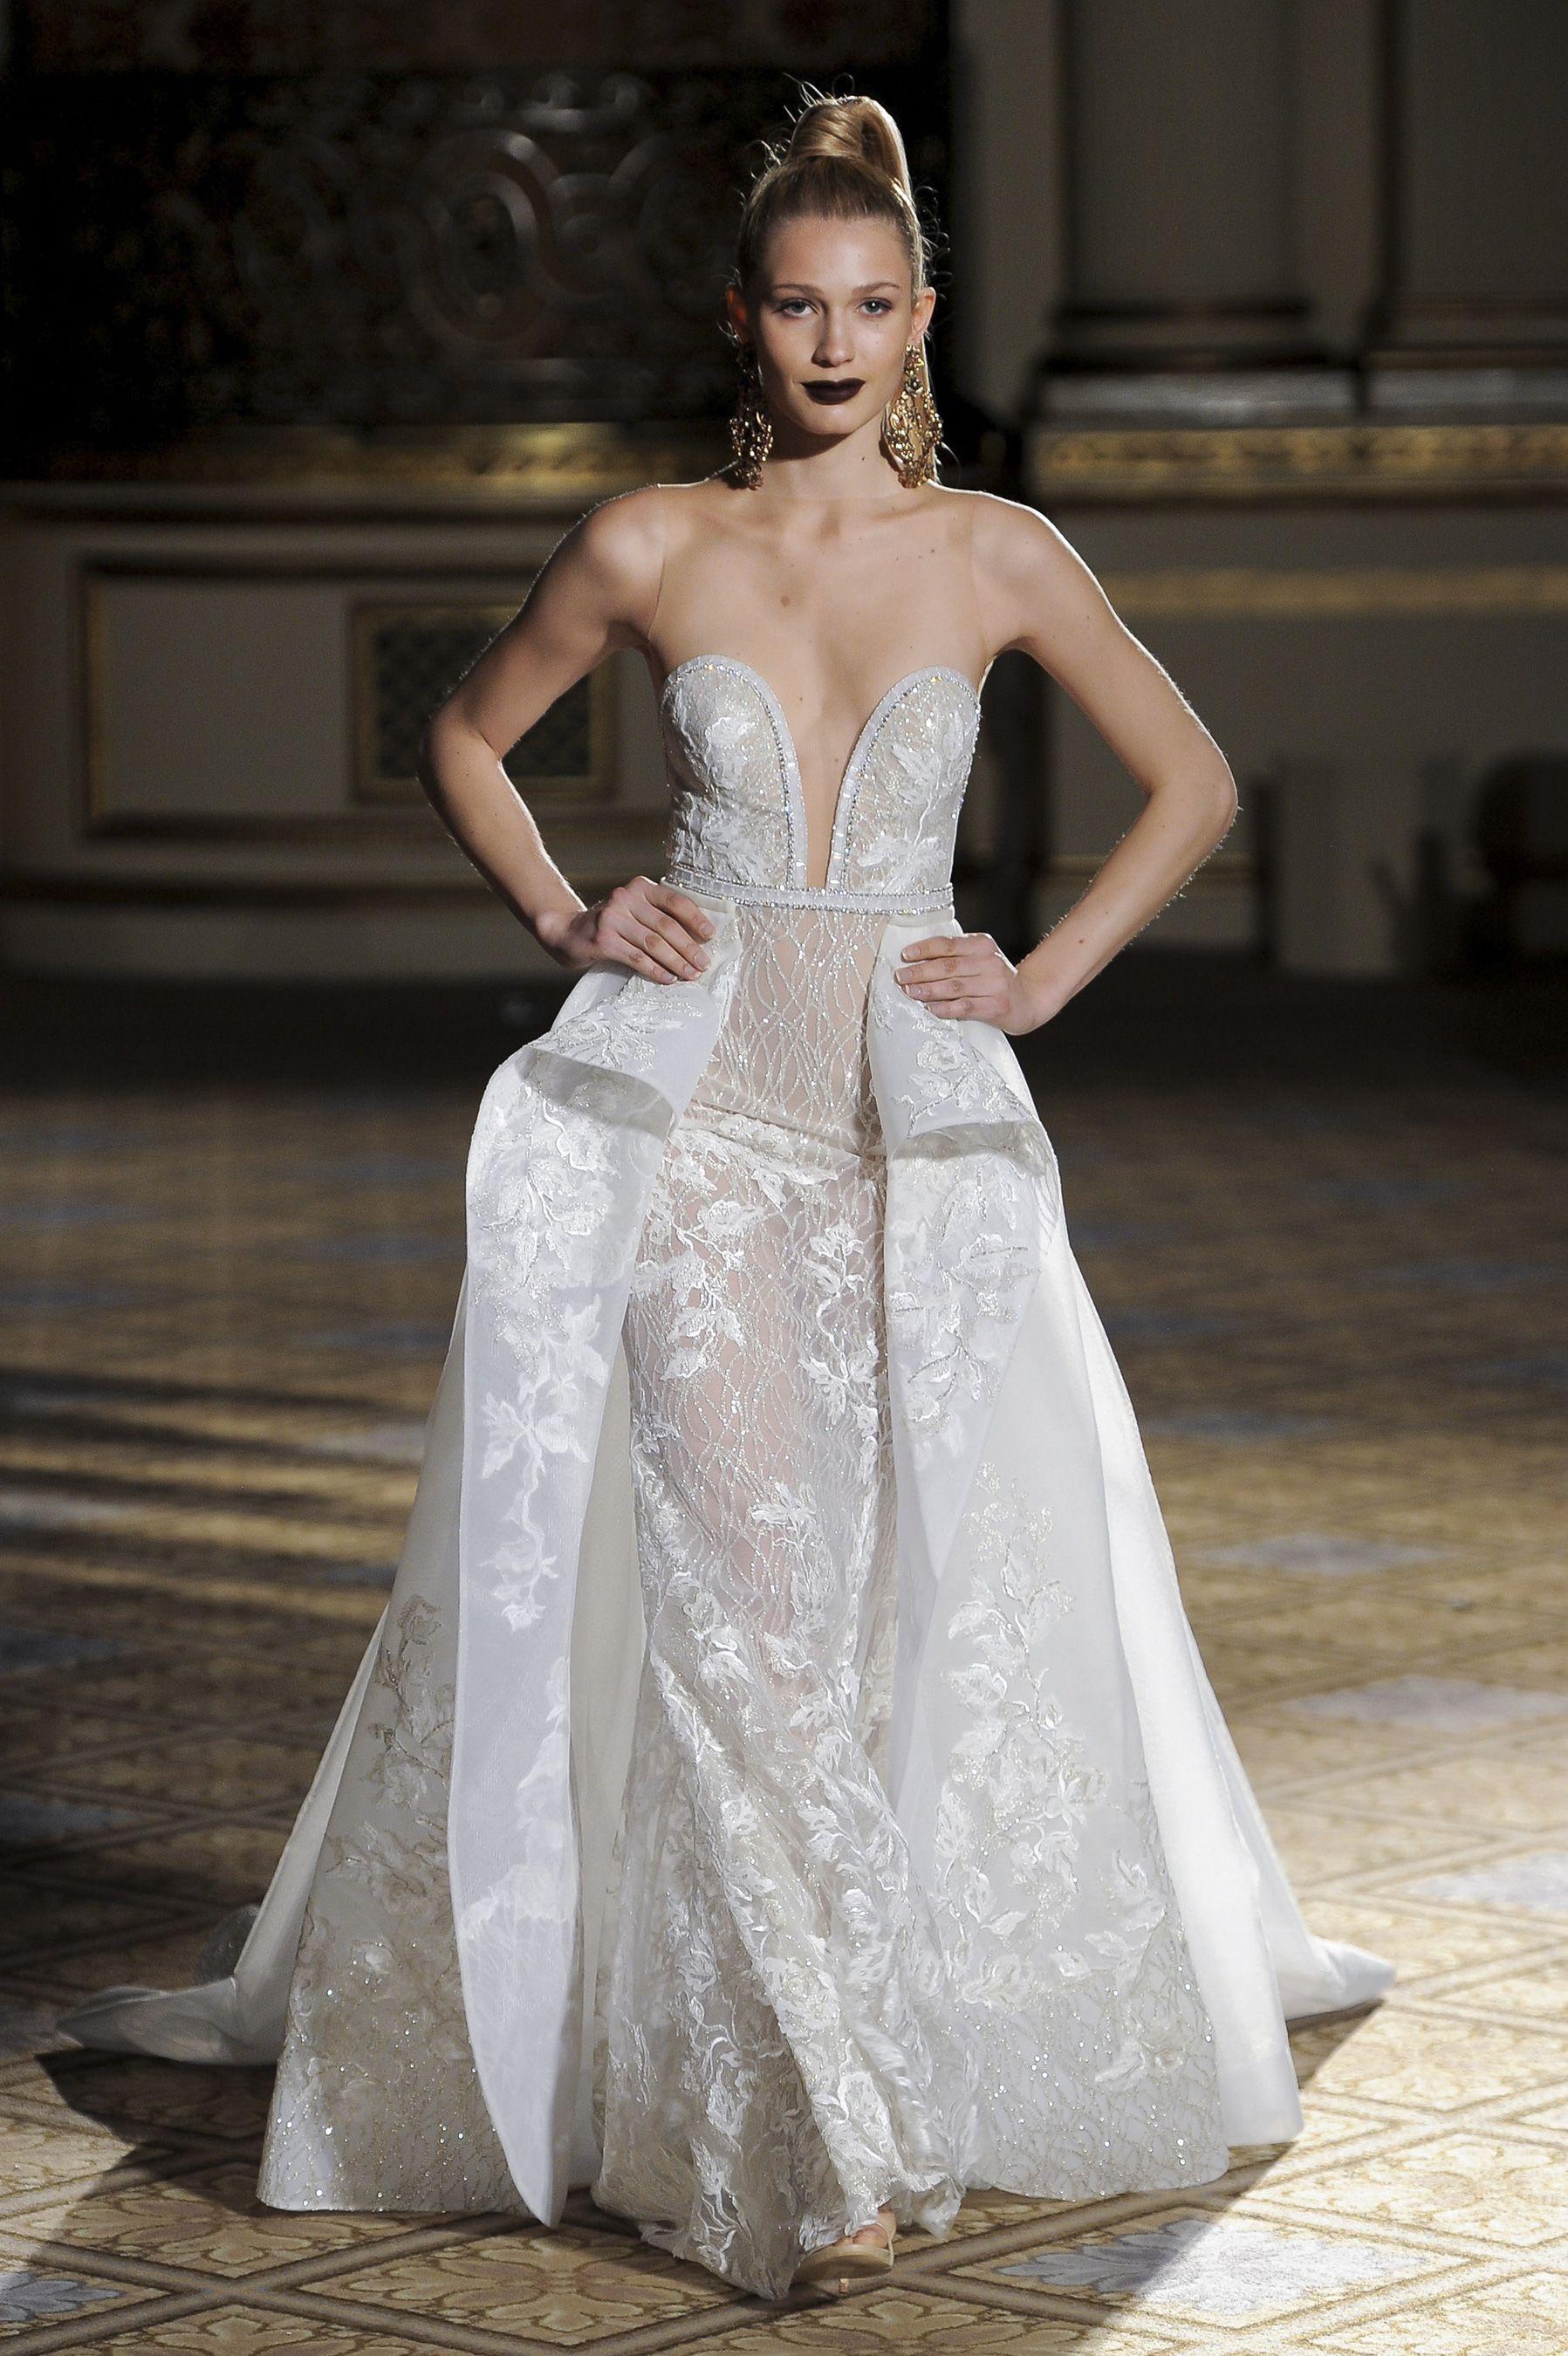 Lightweight wedding dresses  Berta Bridal Spring  Bridal Fashion Show  Mermaid gown and